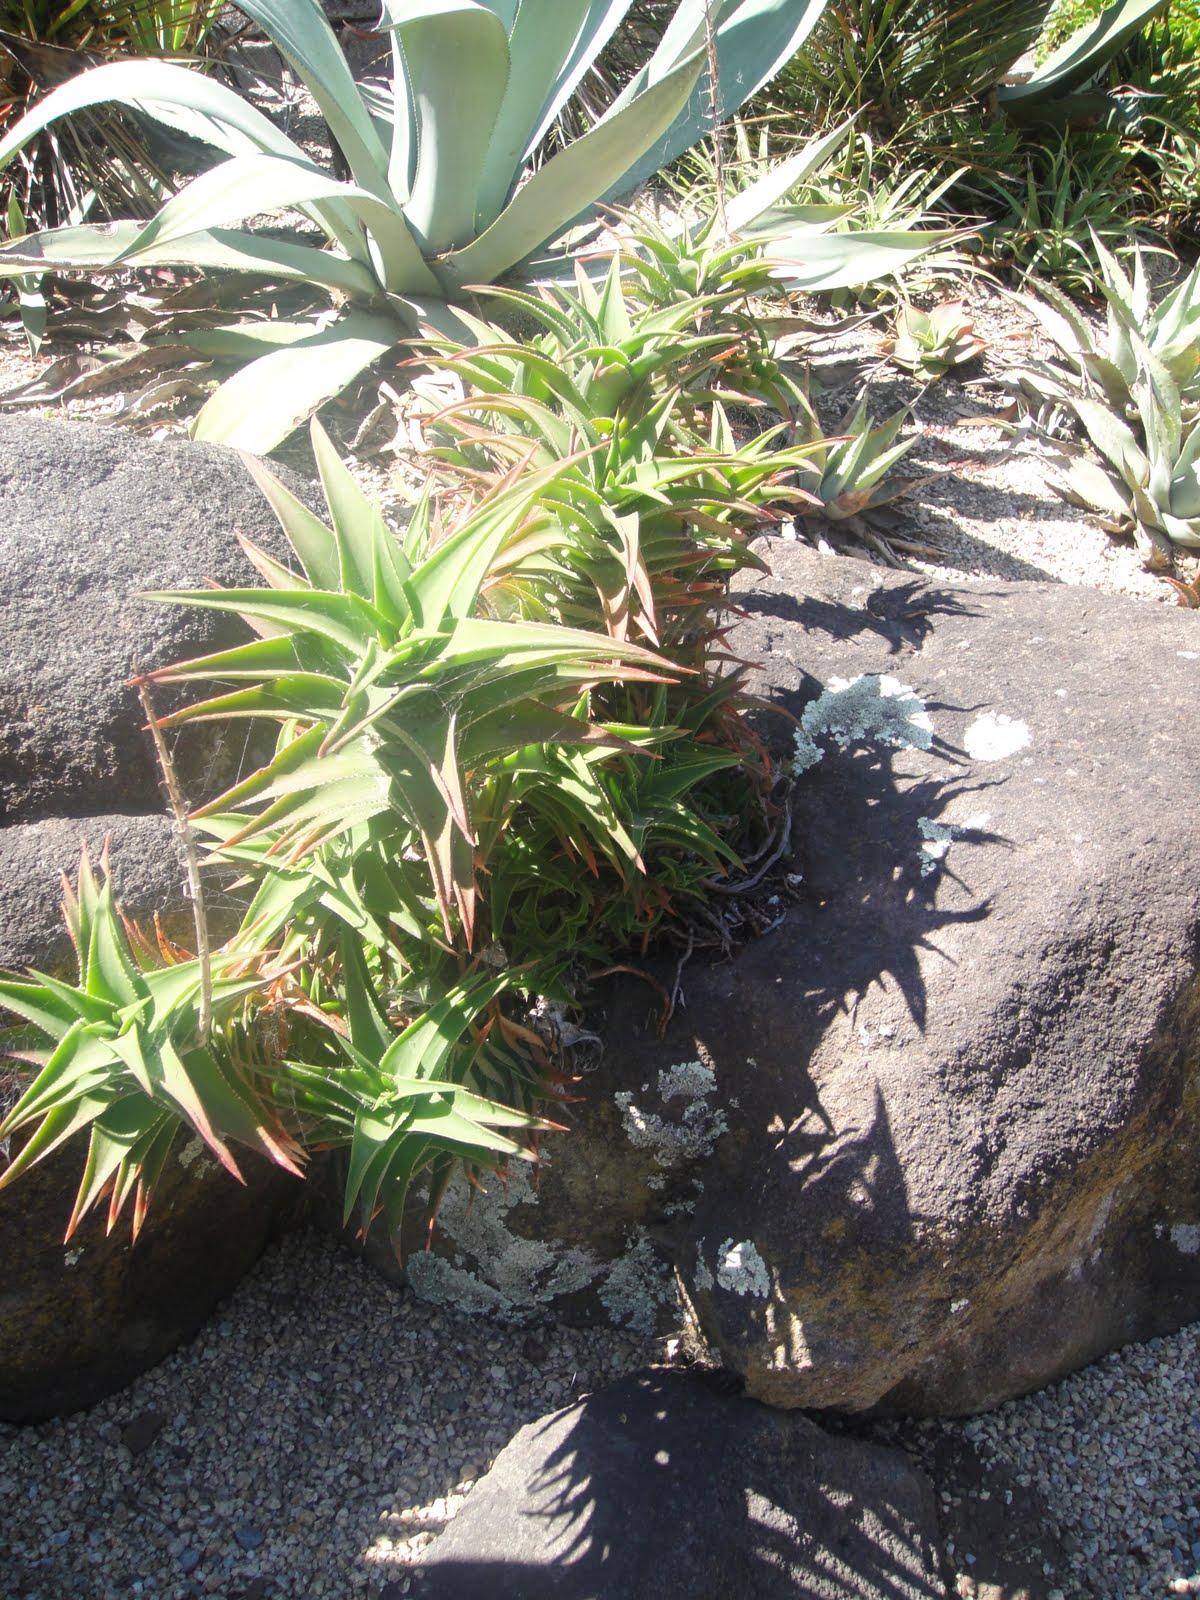 Succulent Rock Garden Ideas Photograph Got some ideas for